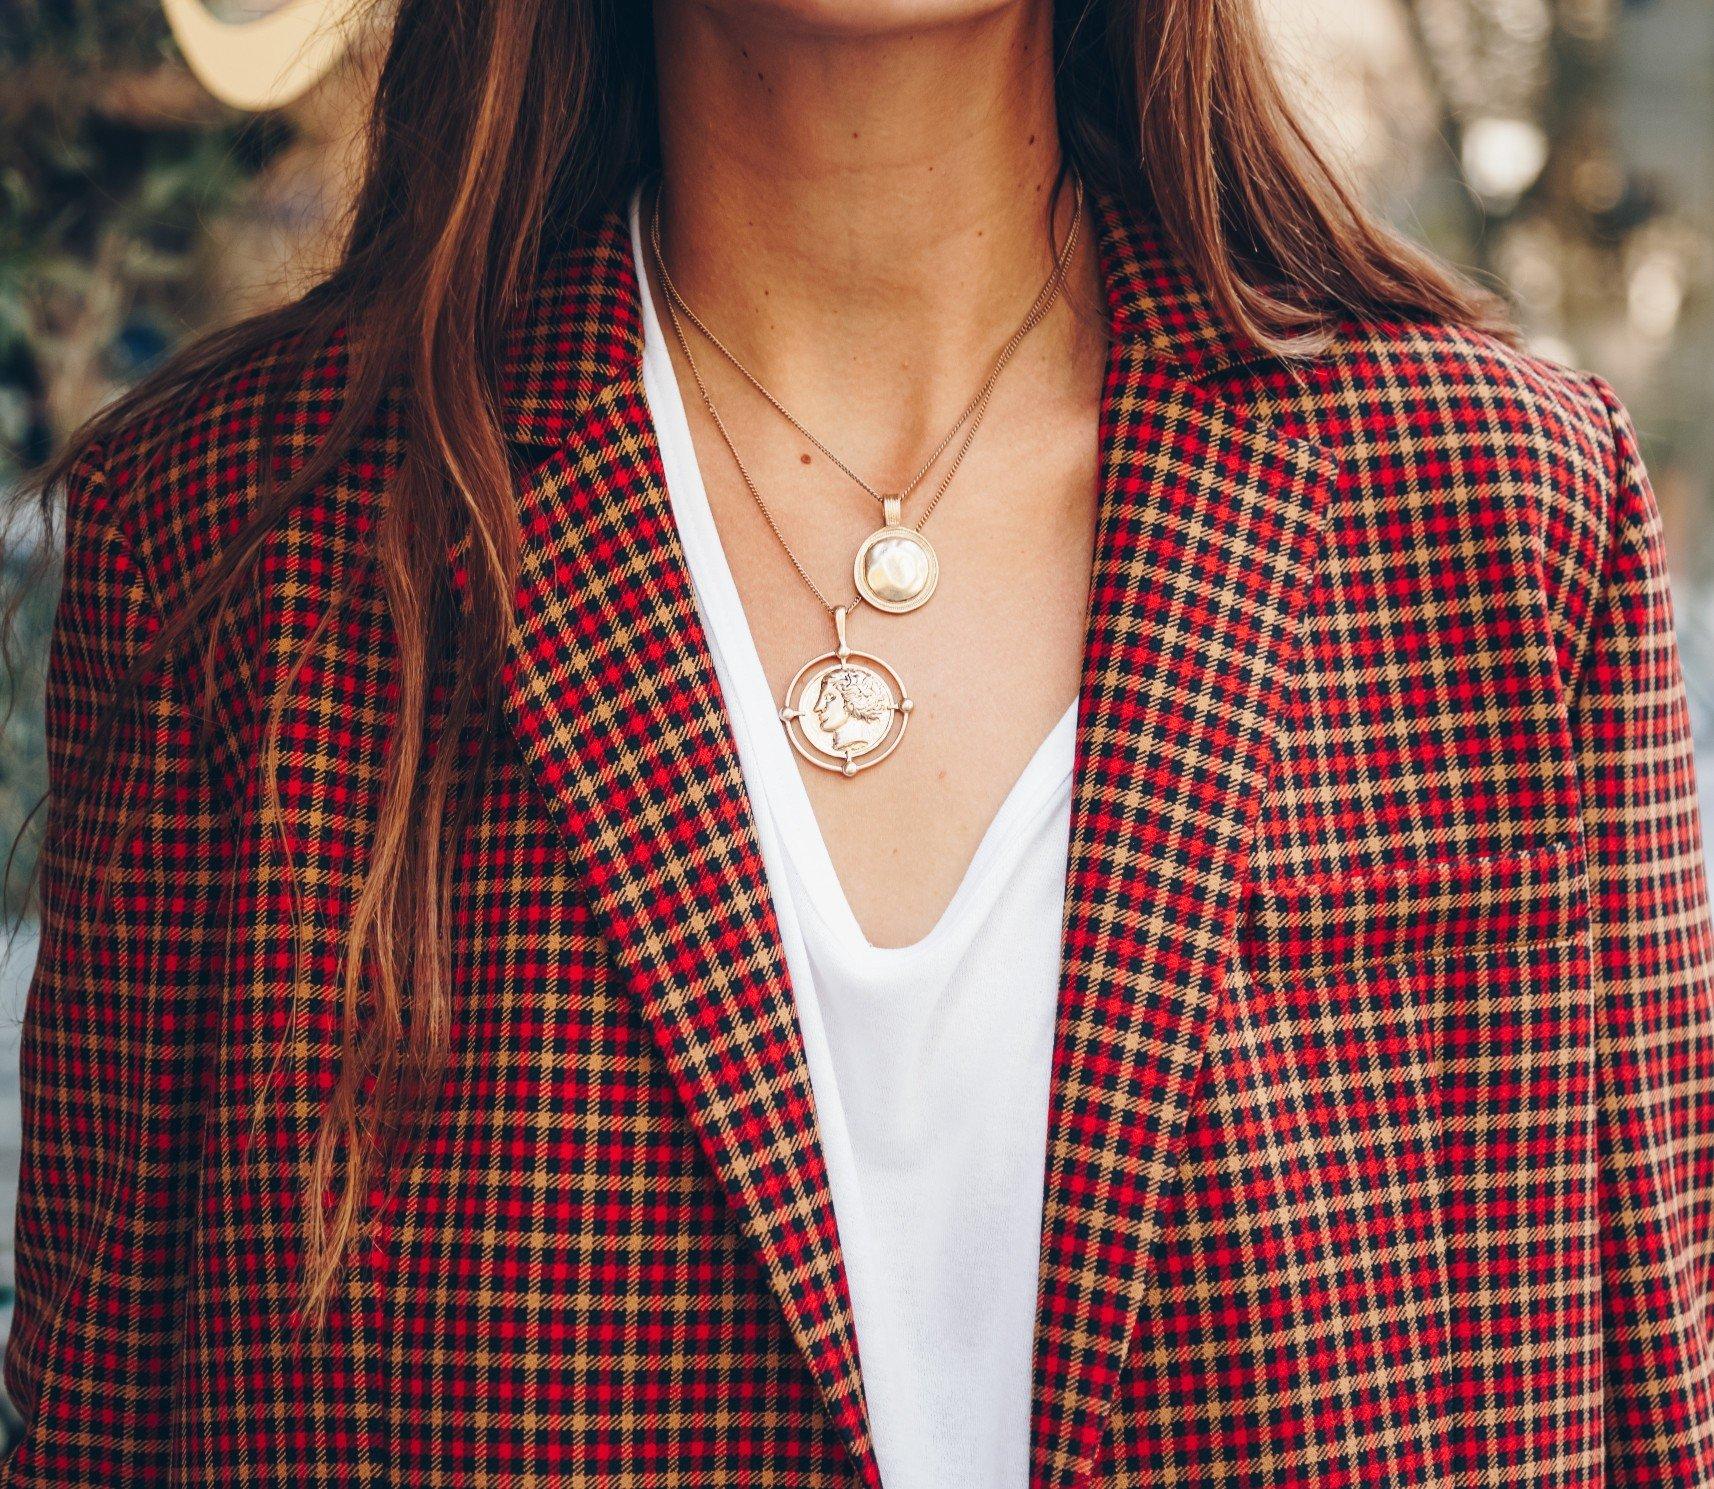 v neck necklace and neckline